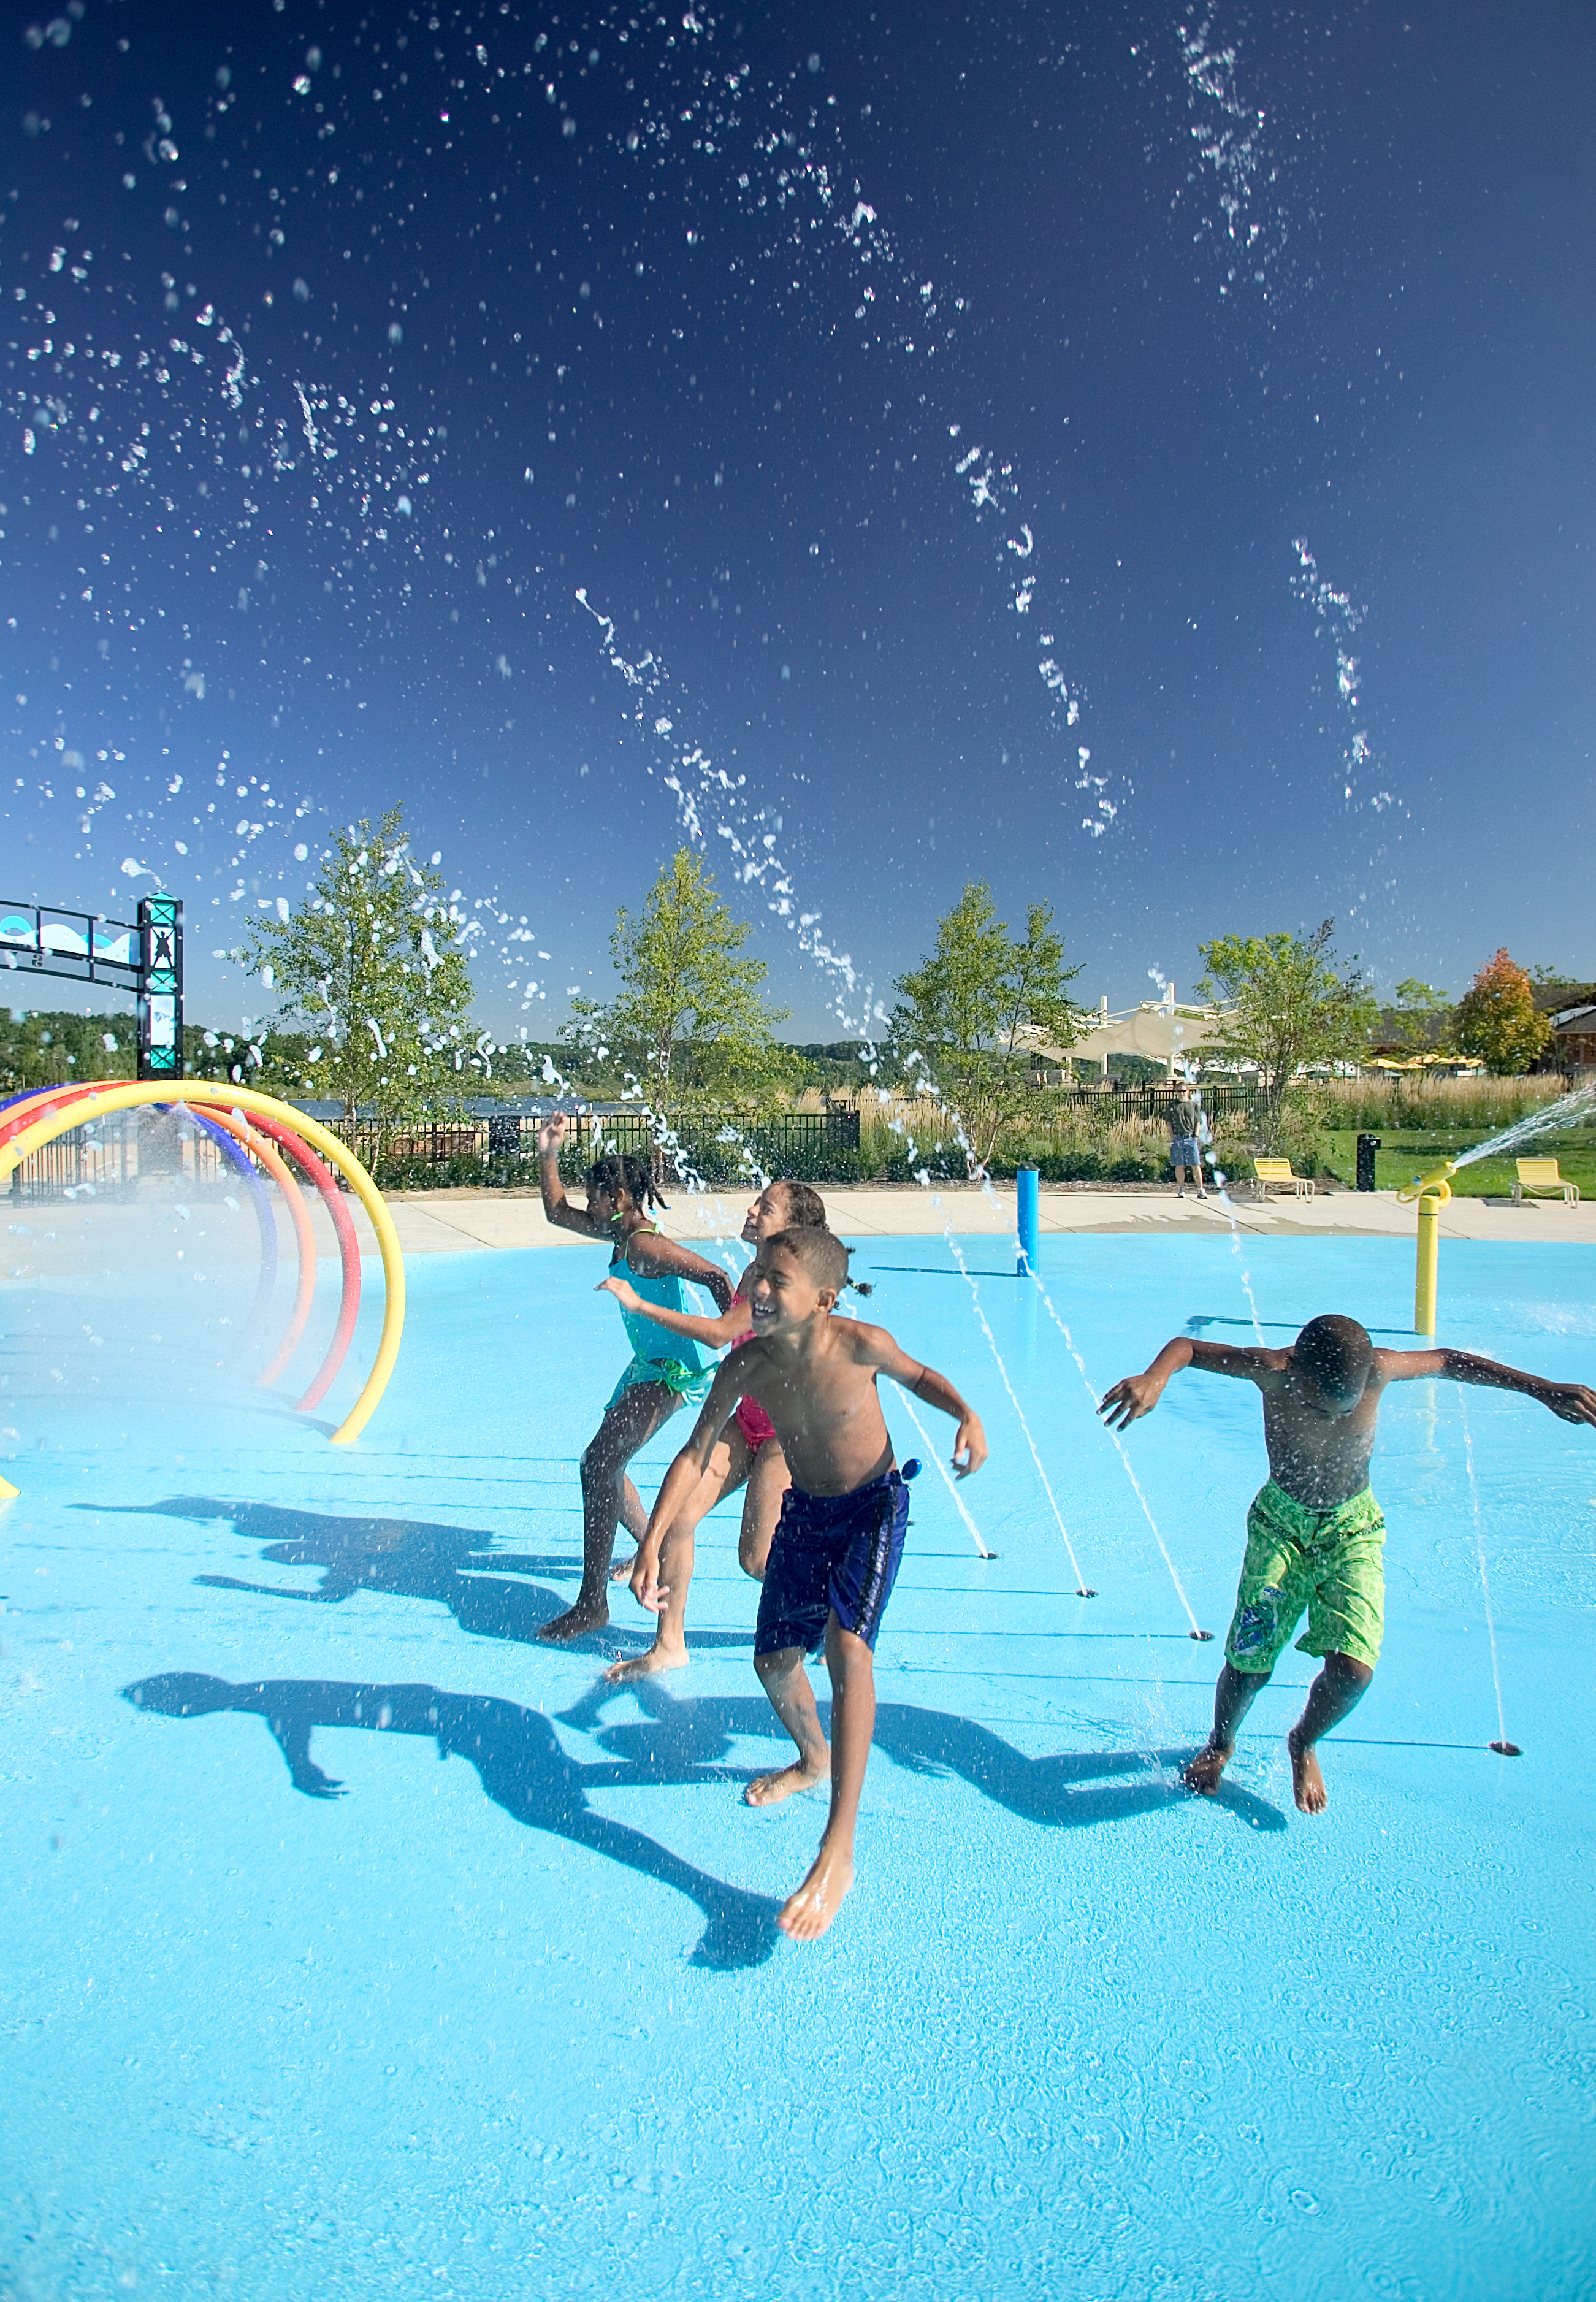 Millennium Park Splash Pad